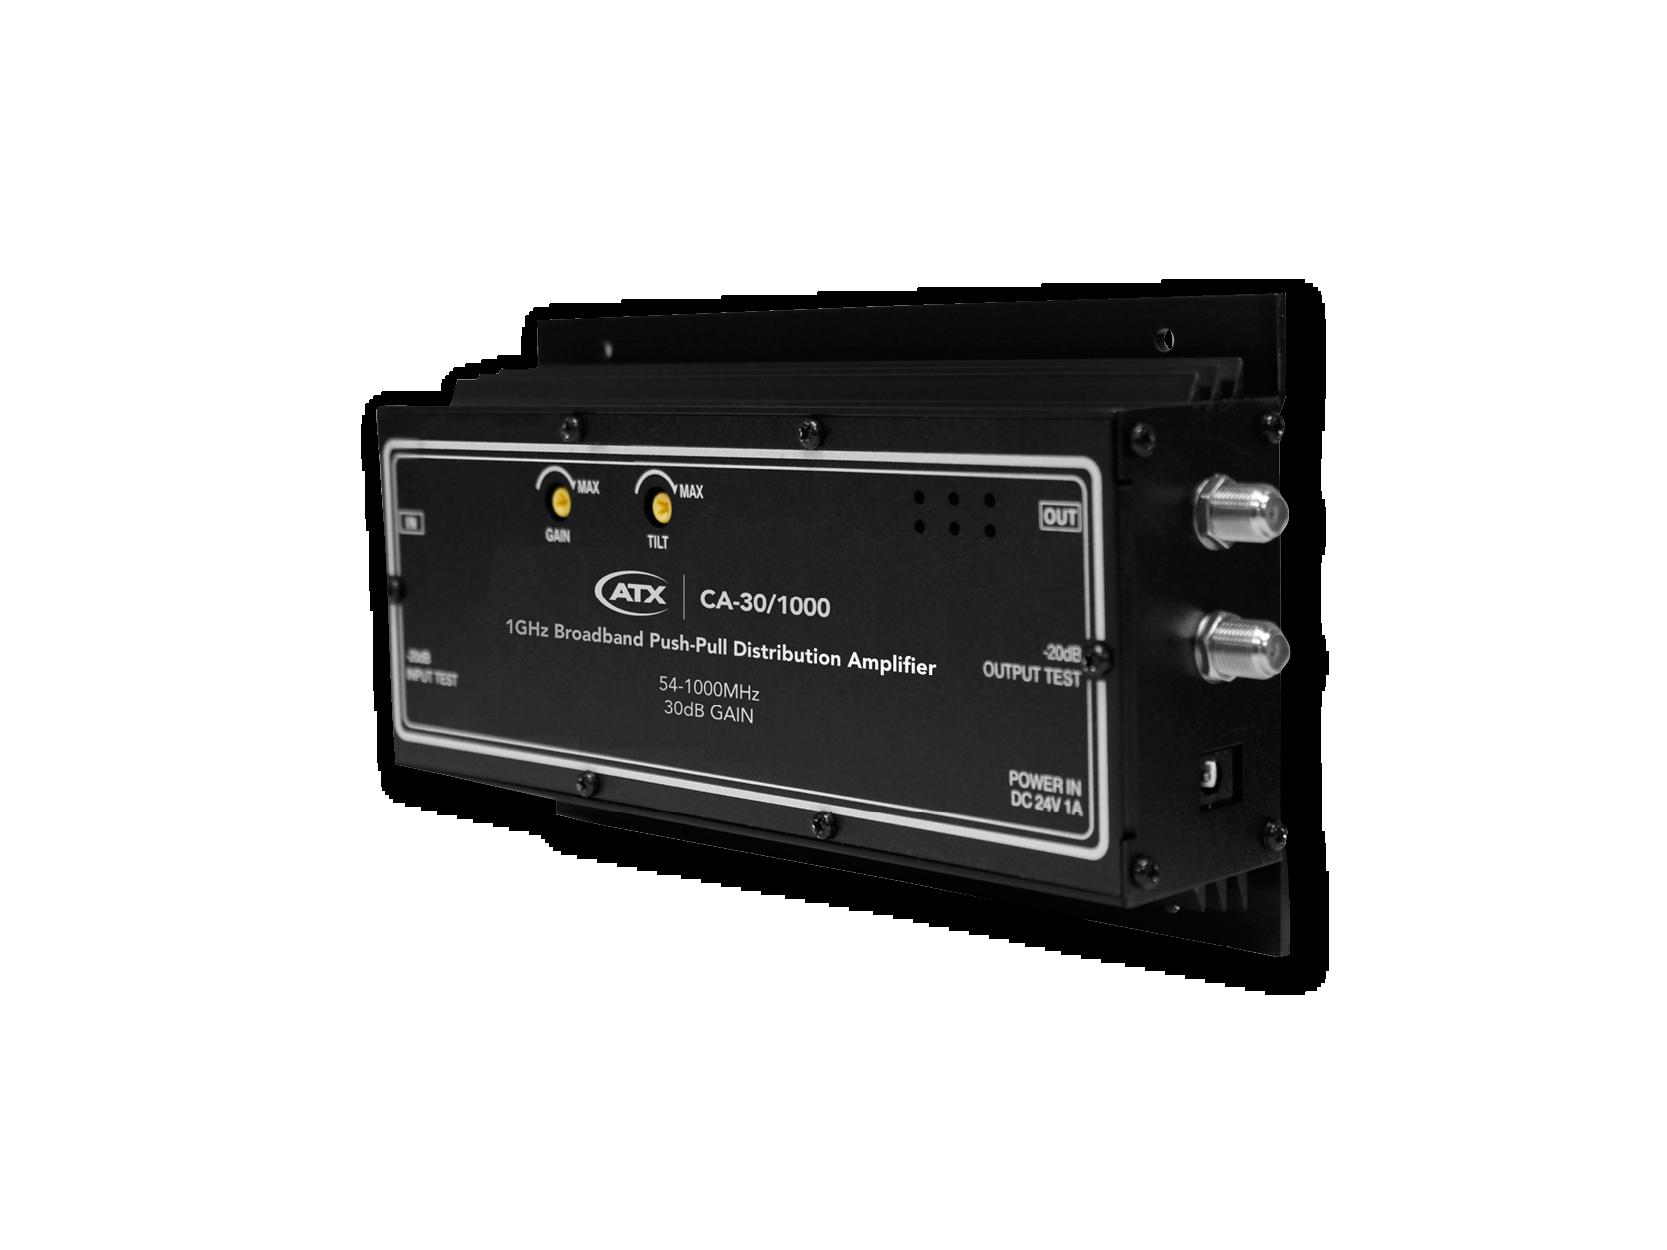 CA-30/1000: 1GHz Broadband Push-Pull Distribution Amplifier